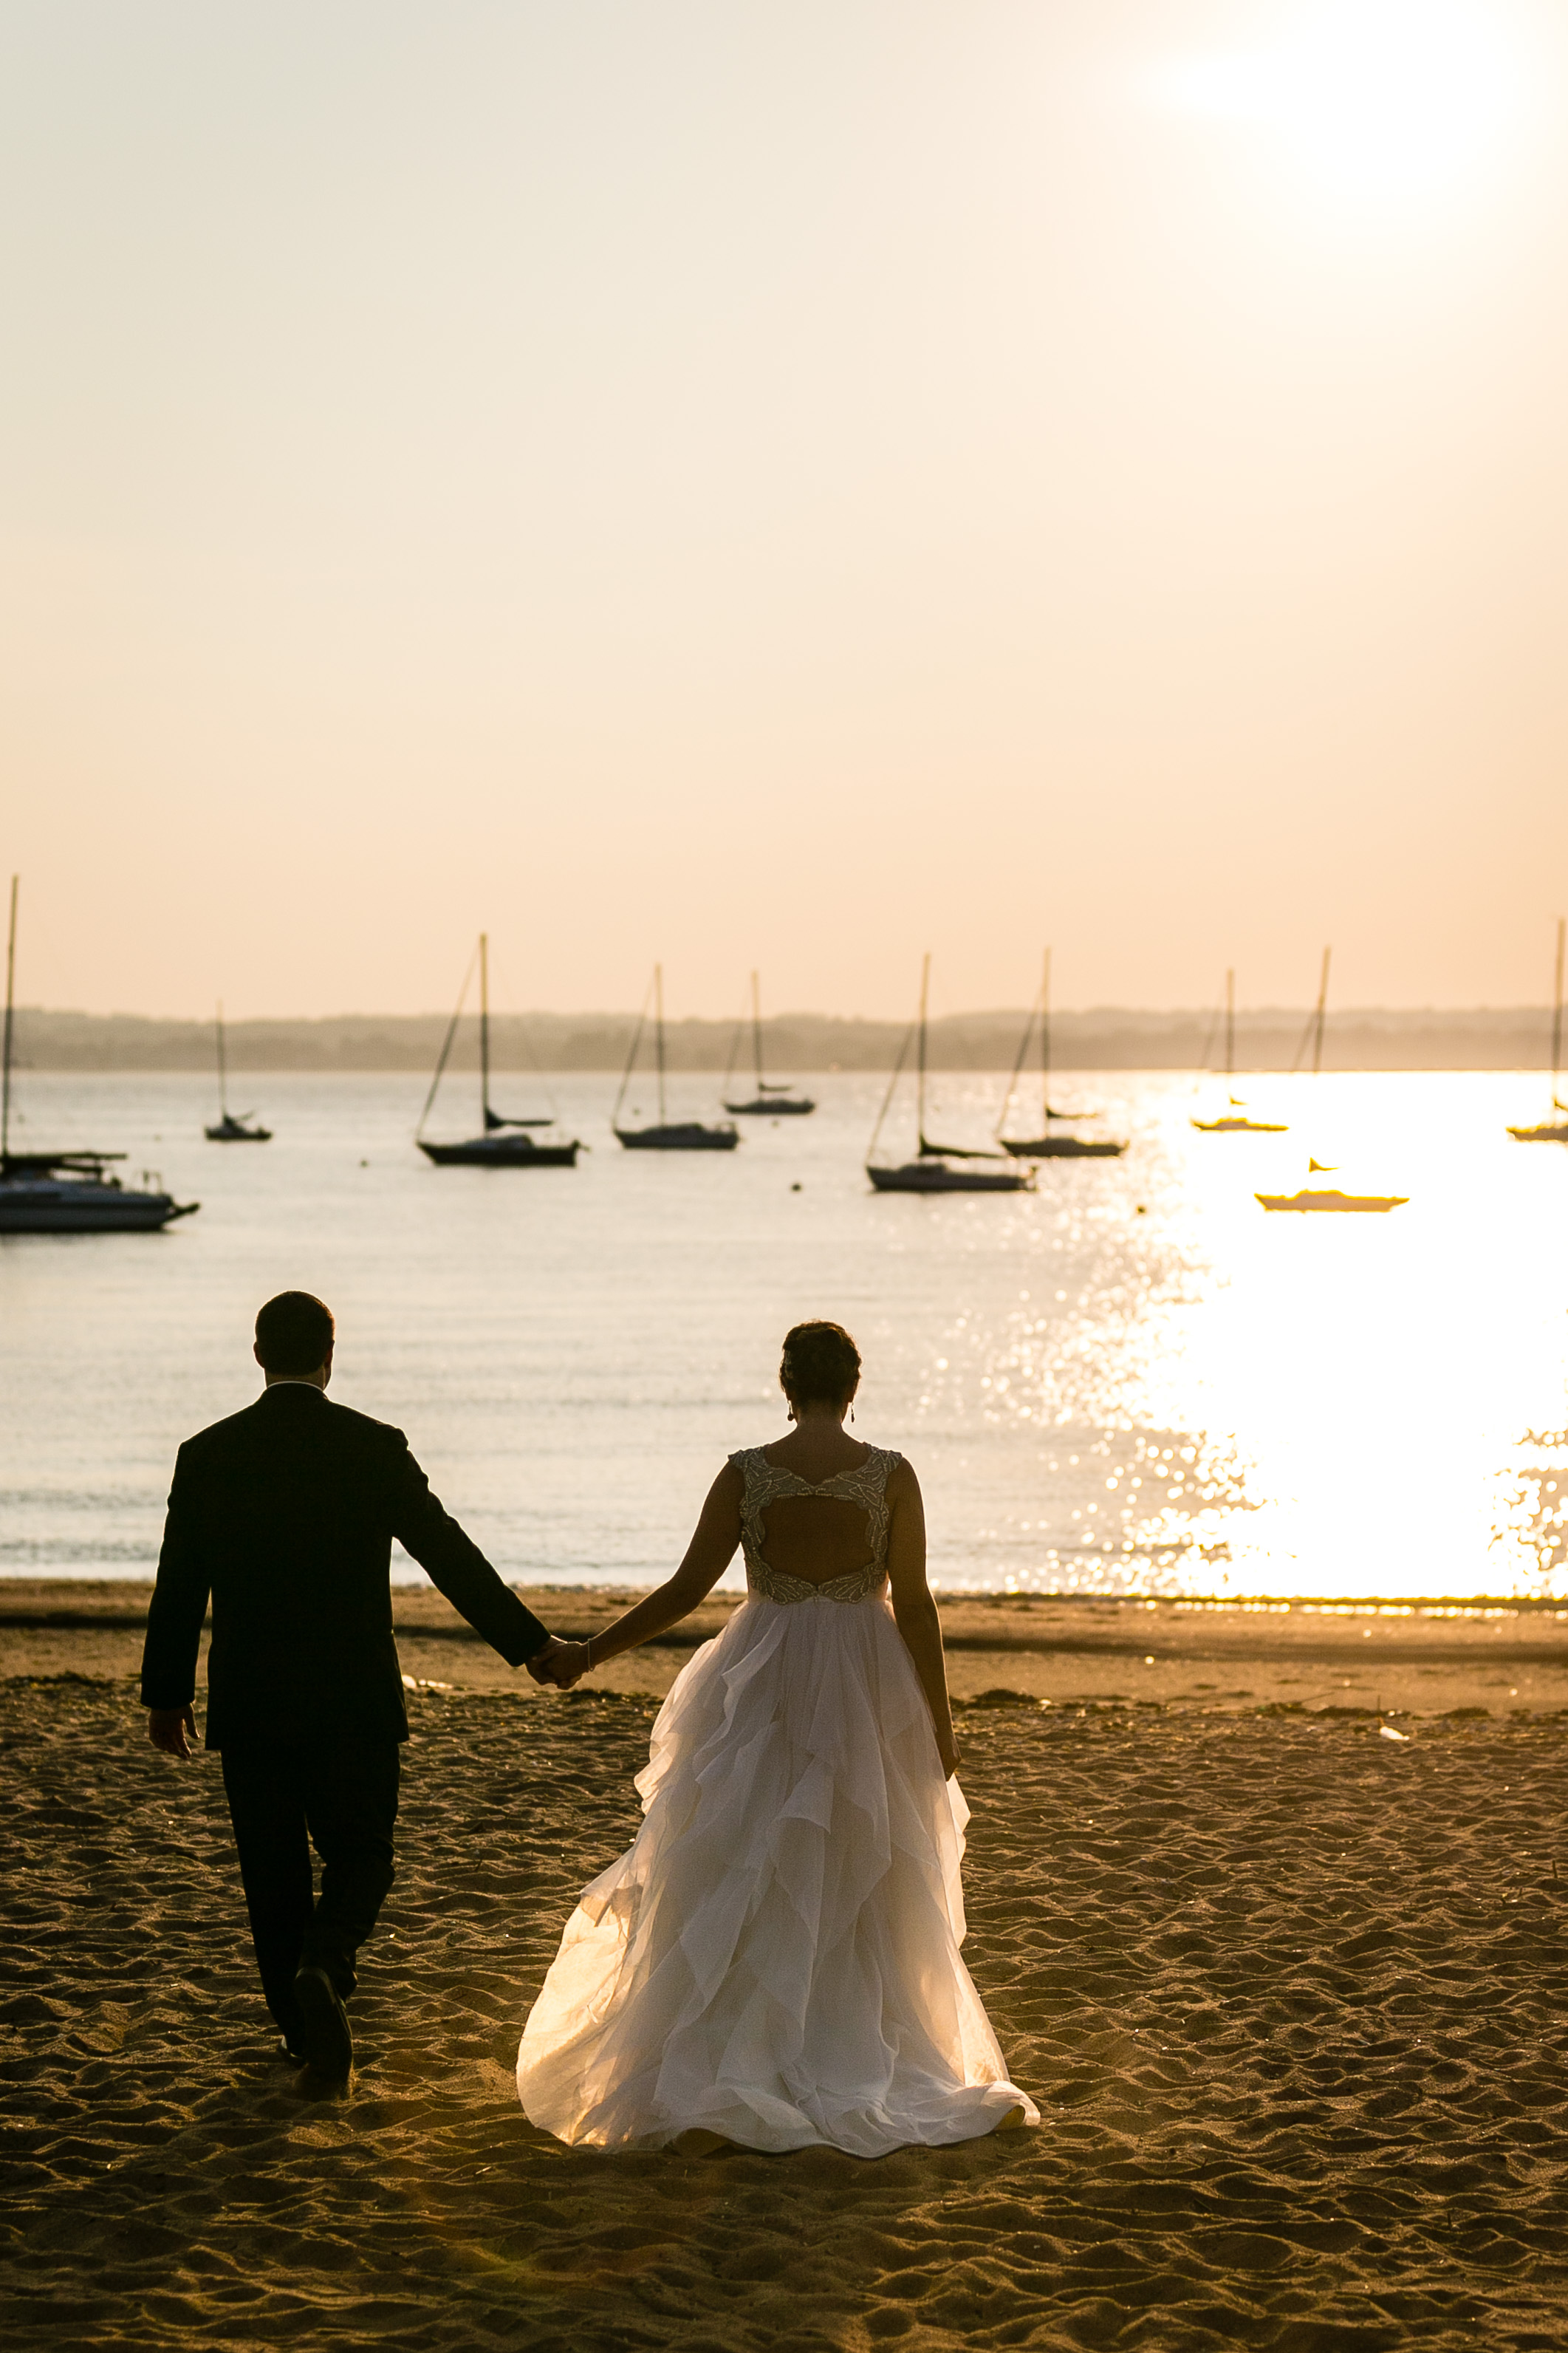 Summer-American-Wedding-Anthonys-Ocean-View-New-Haven-Documentary-Wedding-Photographer-Jacek-Dolata-16.jpg